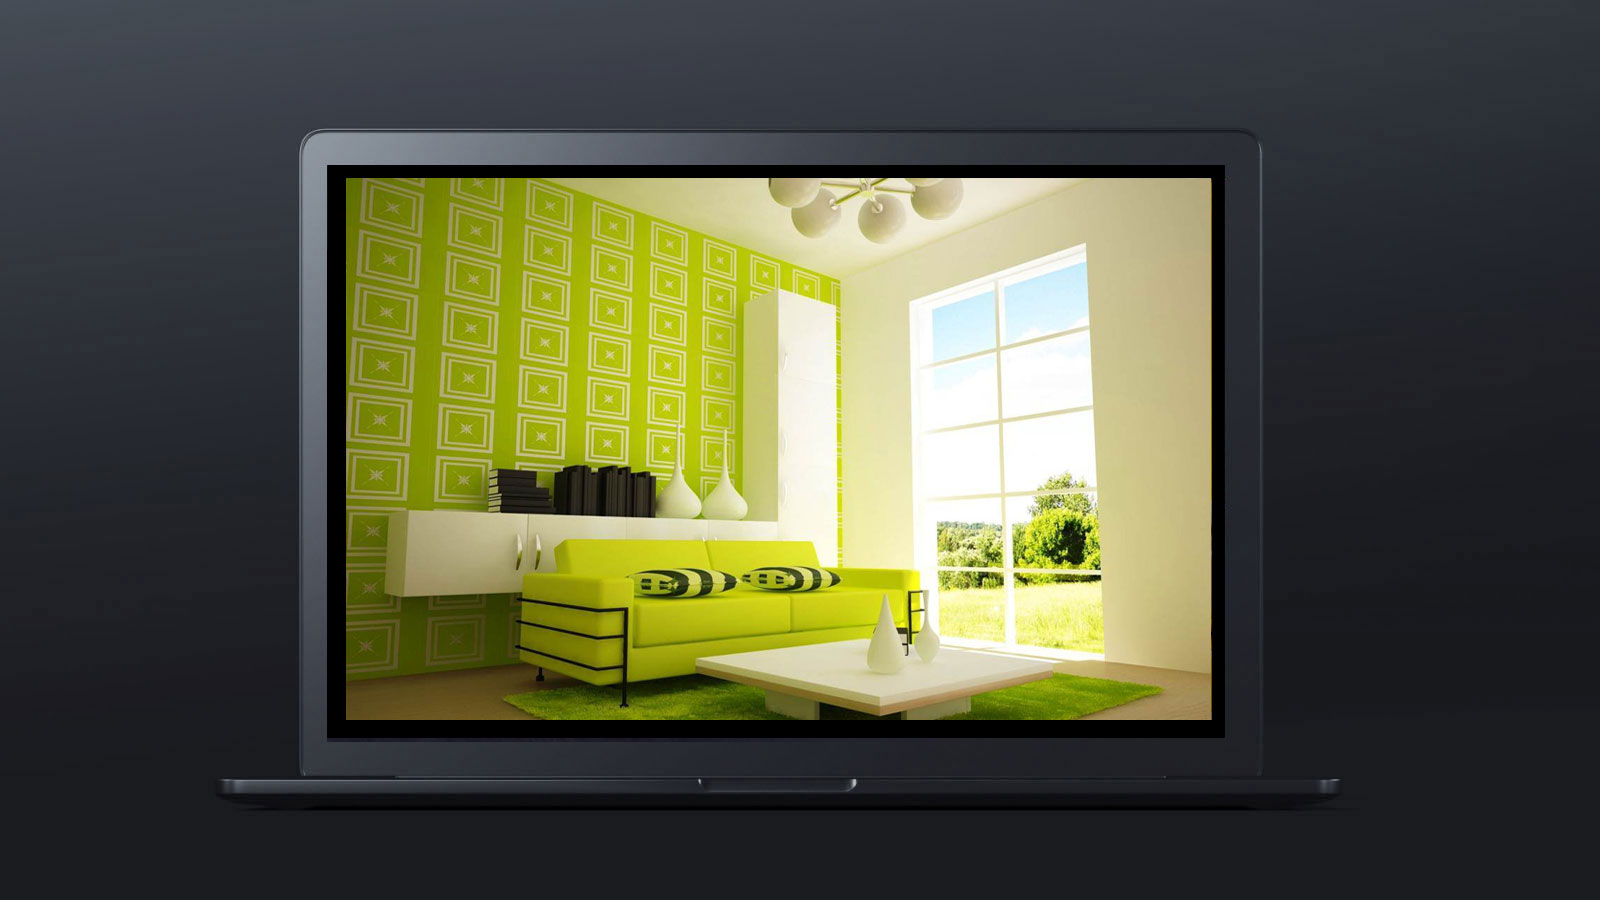 Design Color 7 - نقش رنگ و رنگ آمیزی در دکوراسیون داخلی